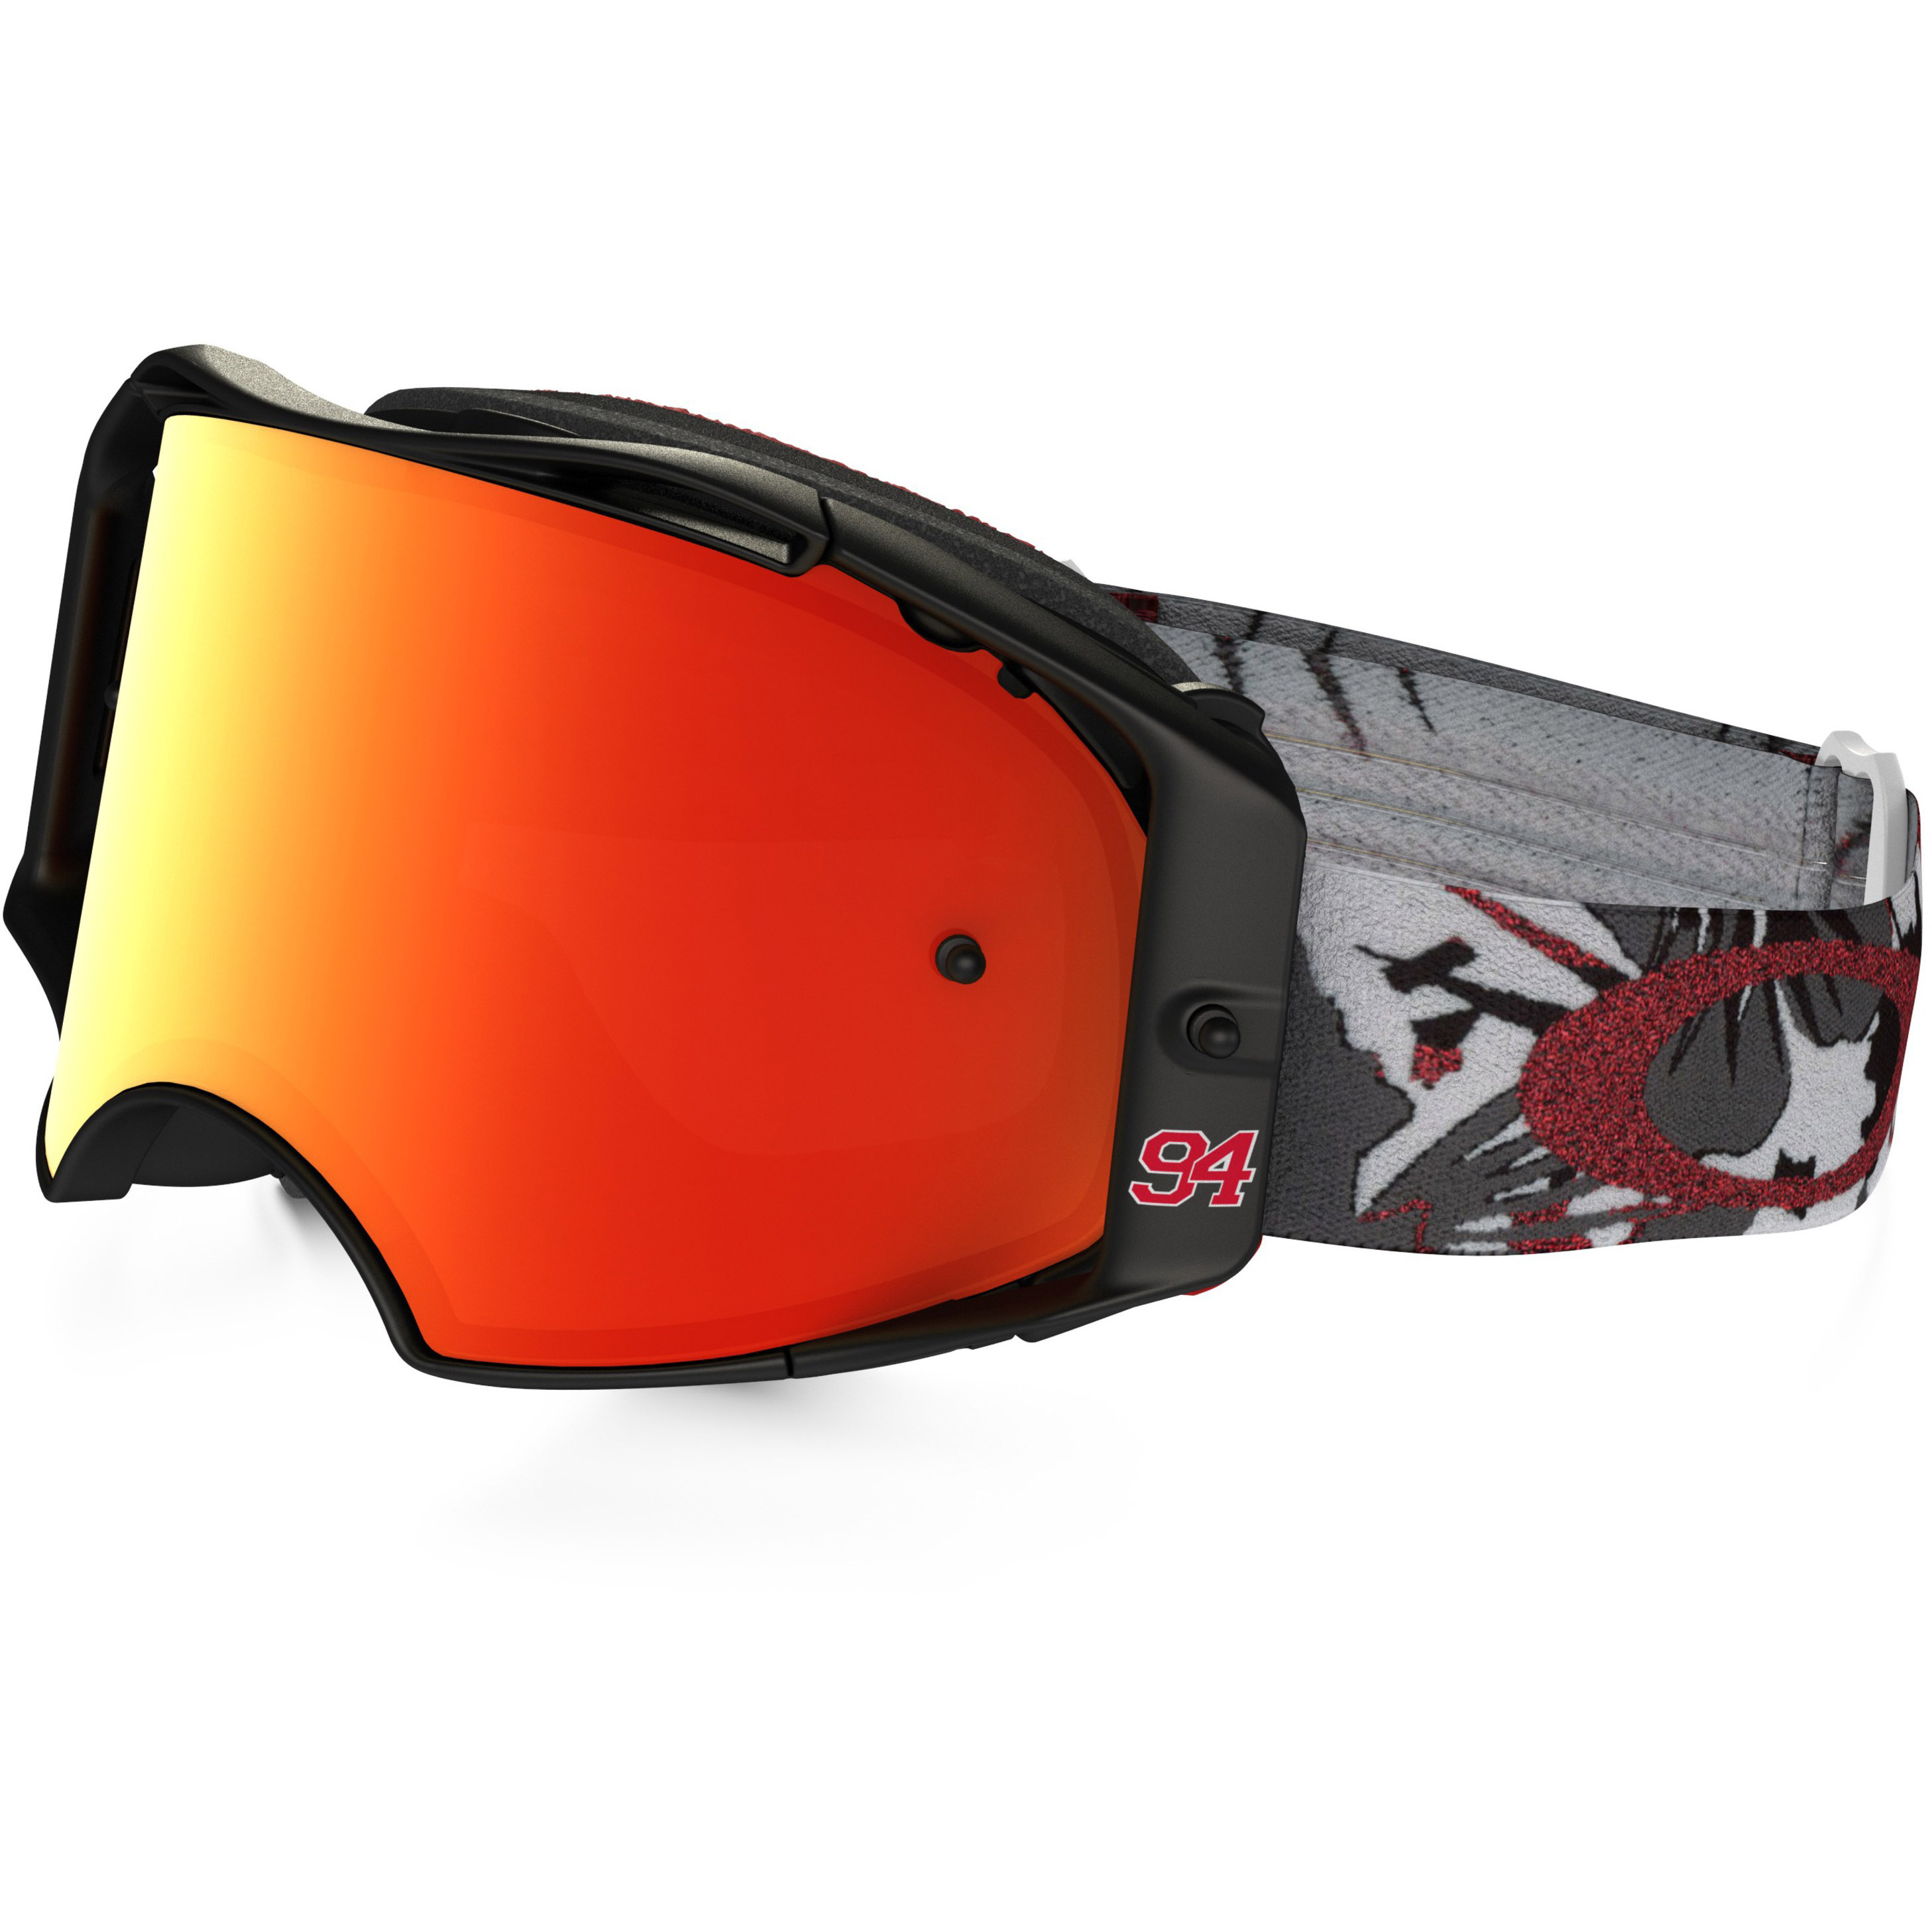 0655b972780 Oakley Goggles O2 MX Intimidator Gunmetal Yellow 24K Iridium   Clear ...